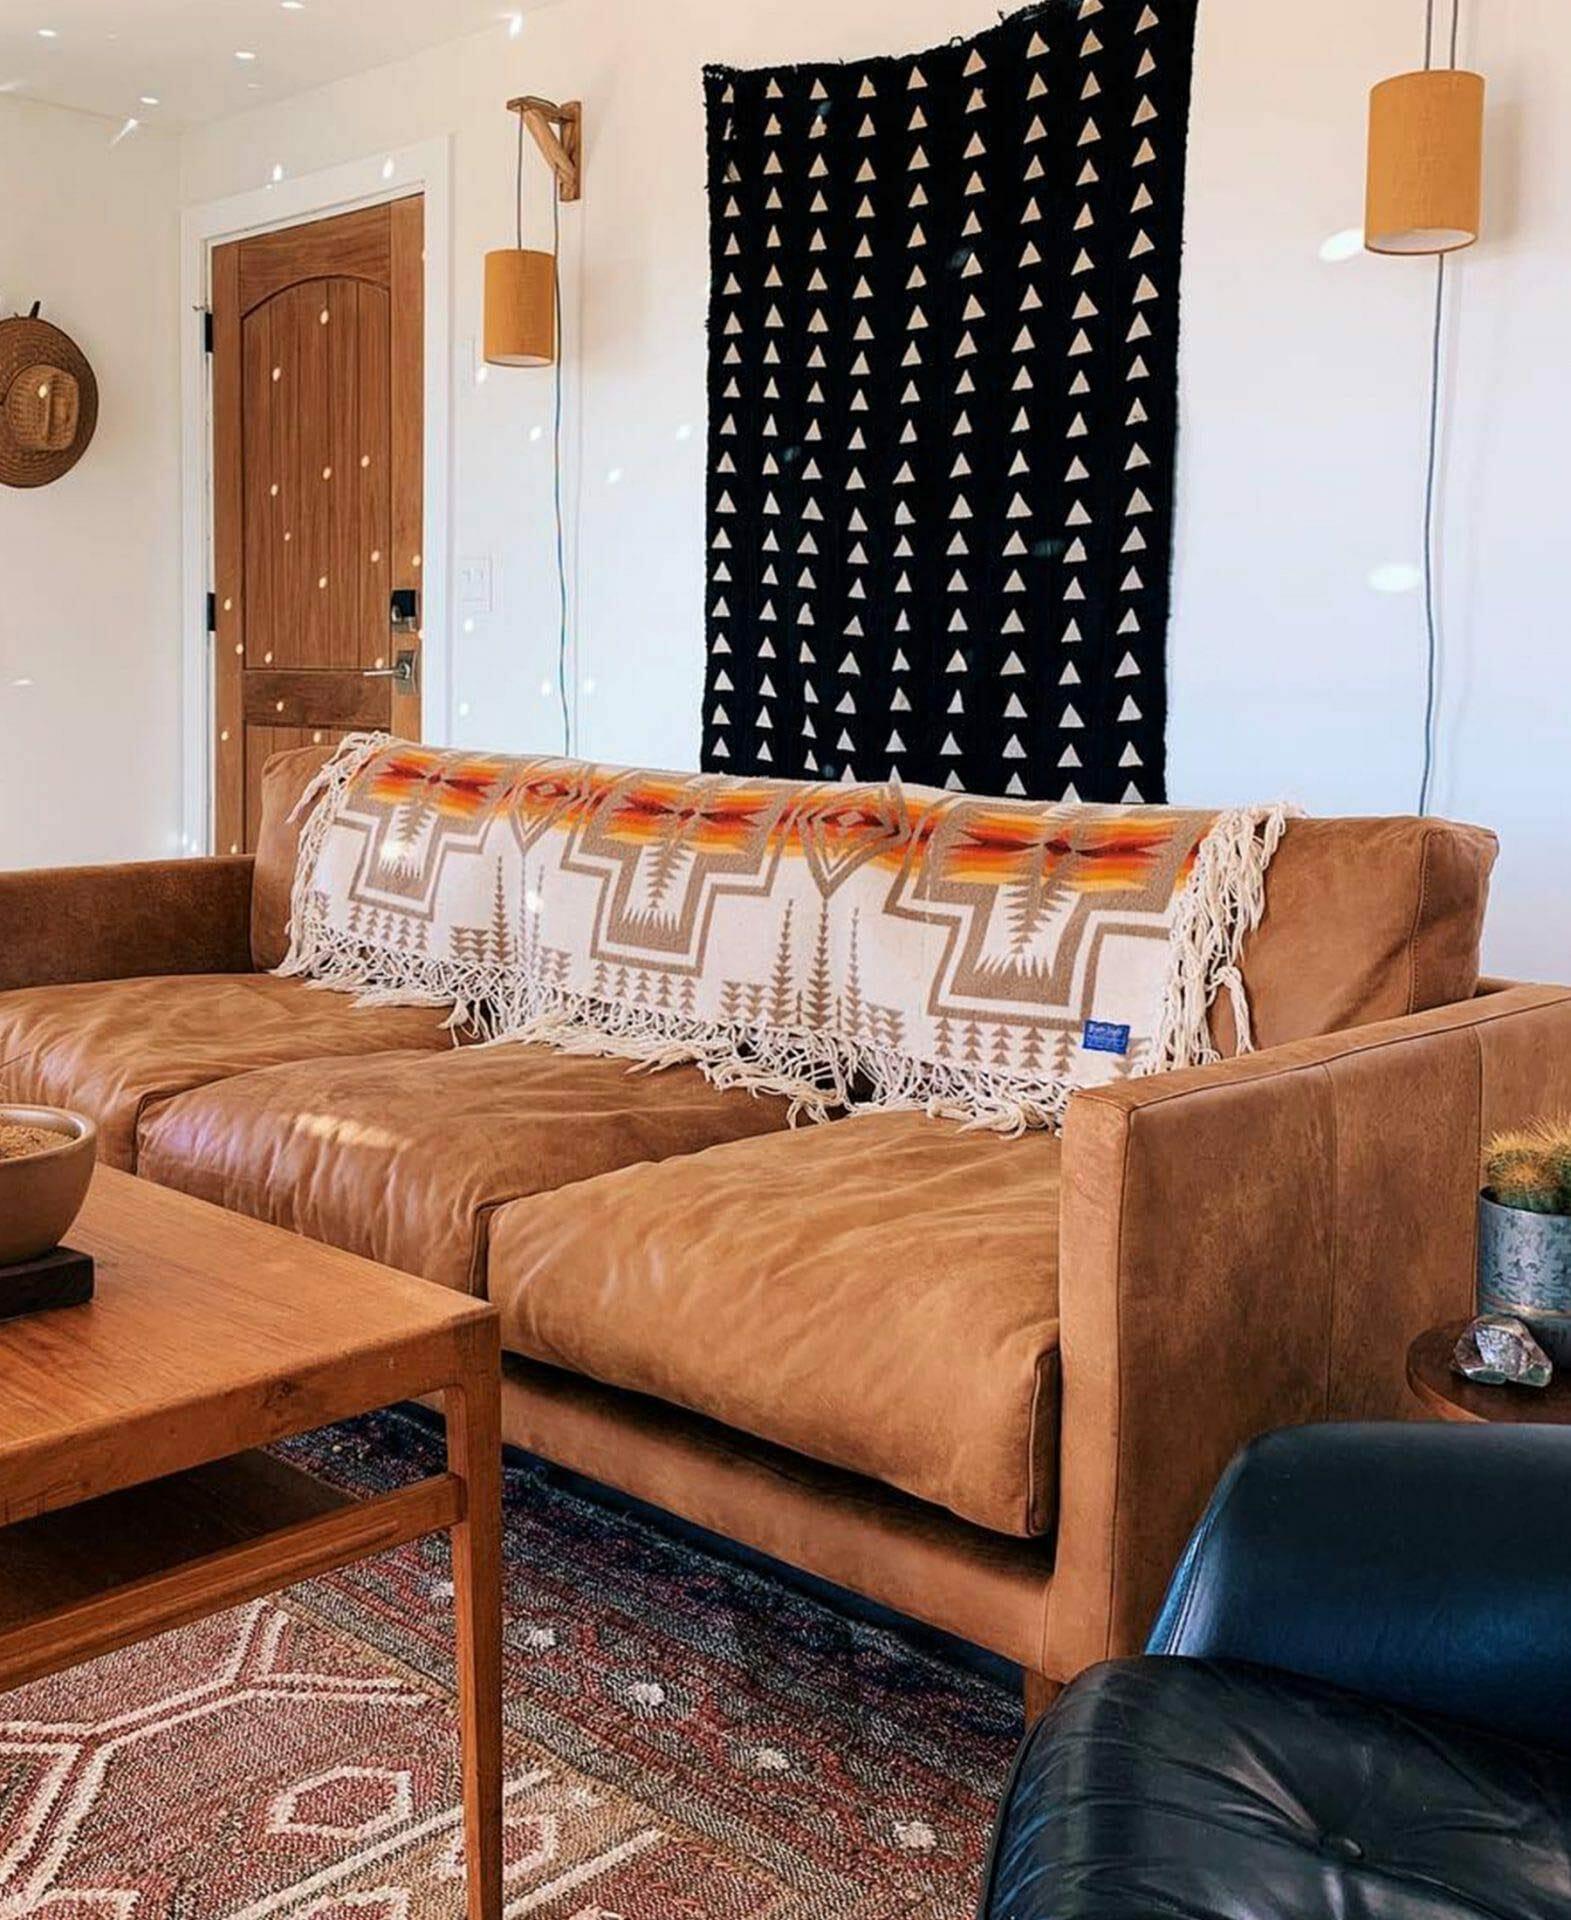 Dakota leather Article sofa from @homesteadhideaway